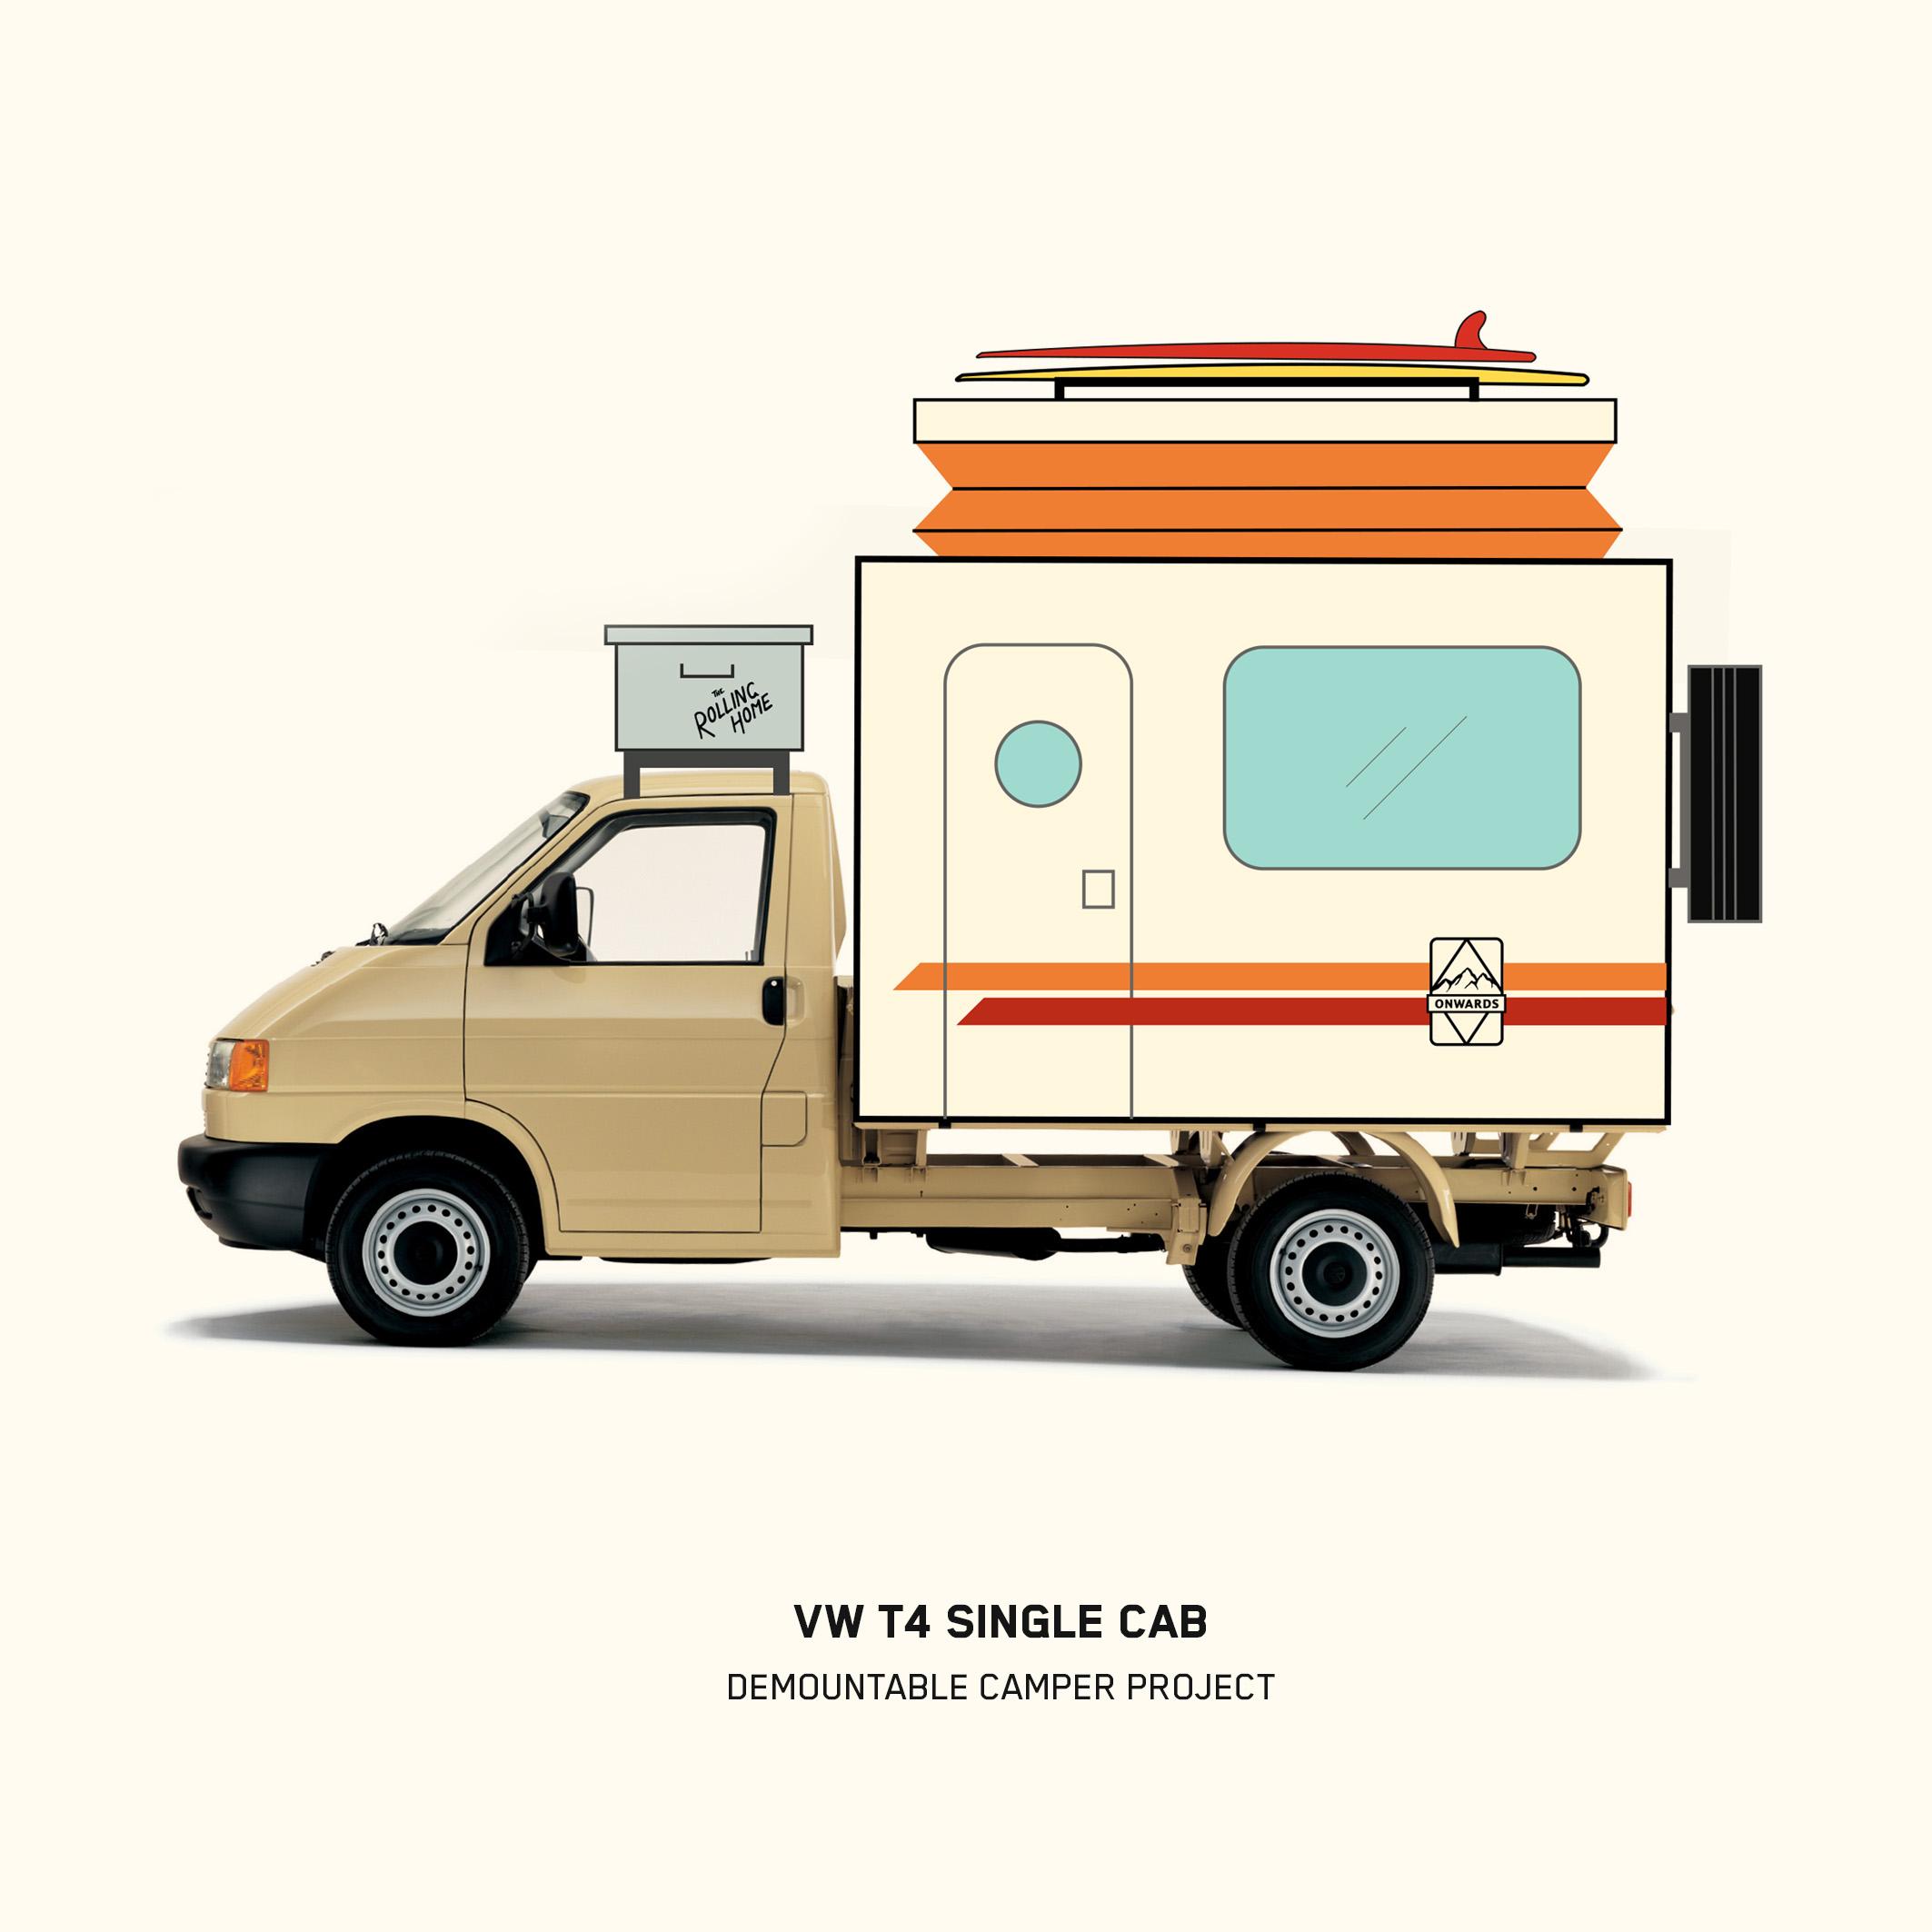 VW DOKA PROJECT VISUAL 01.jpg